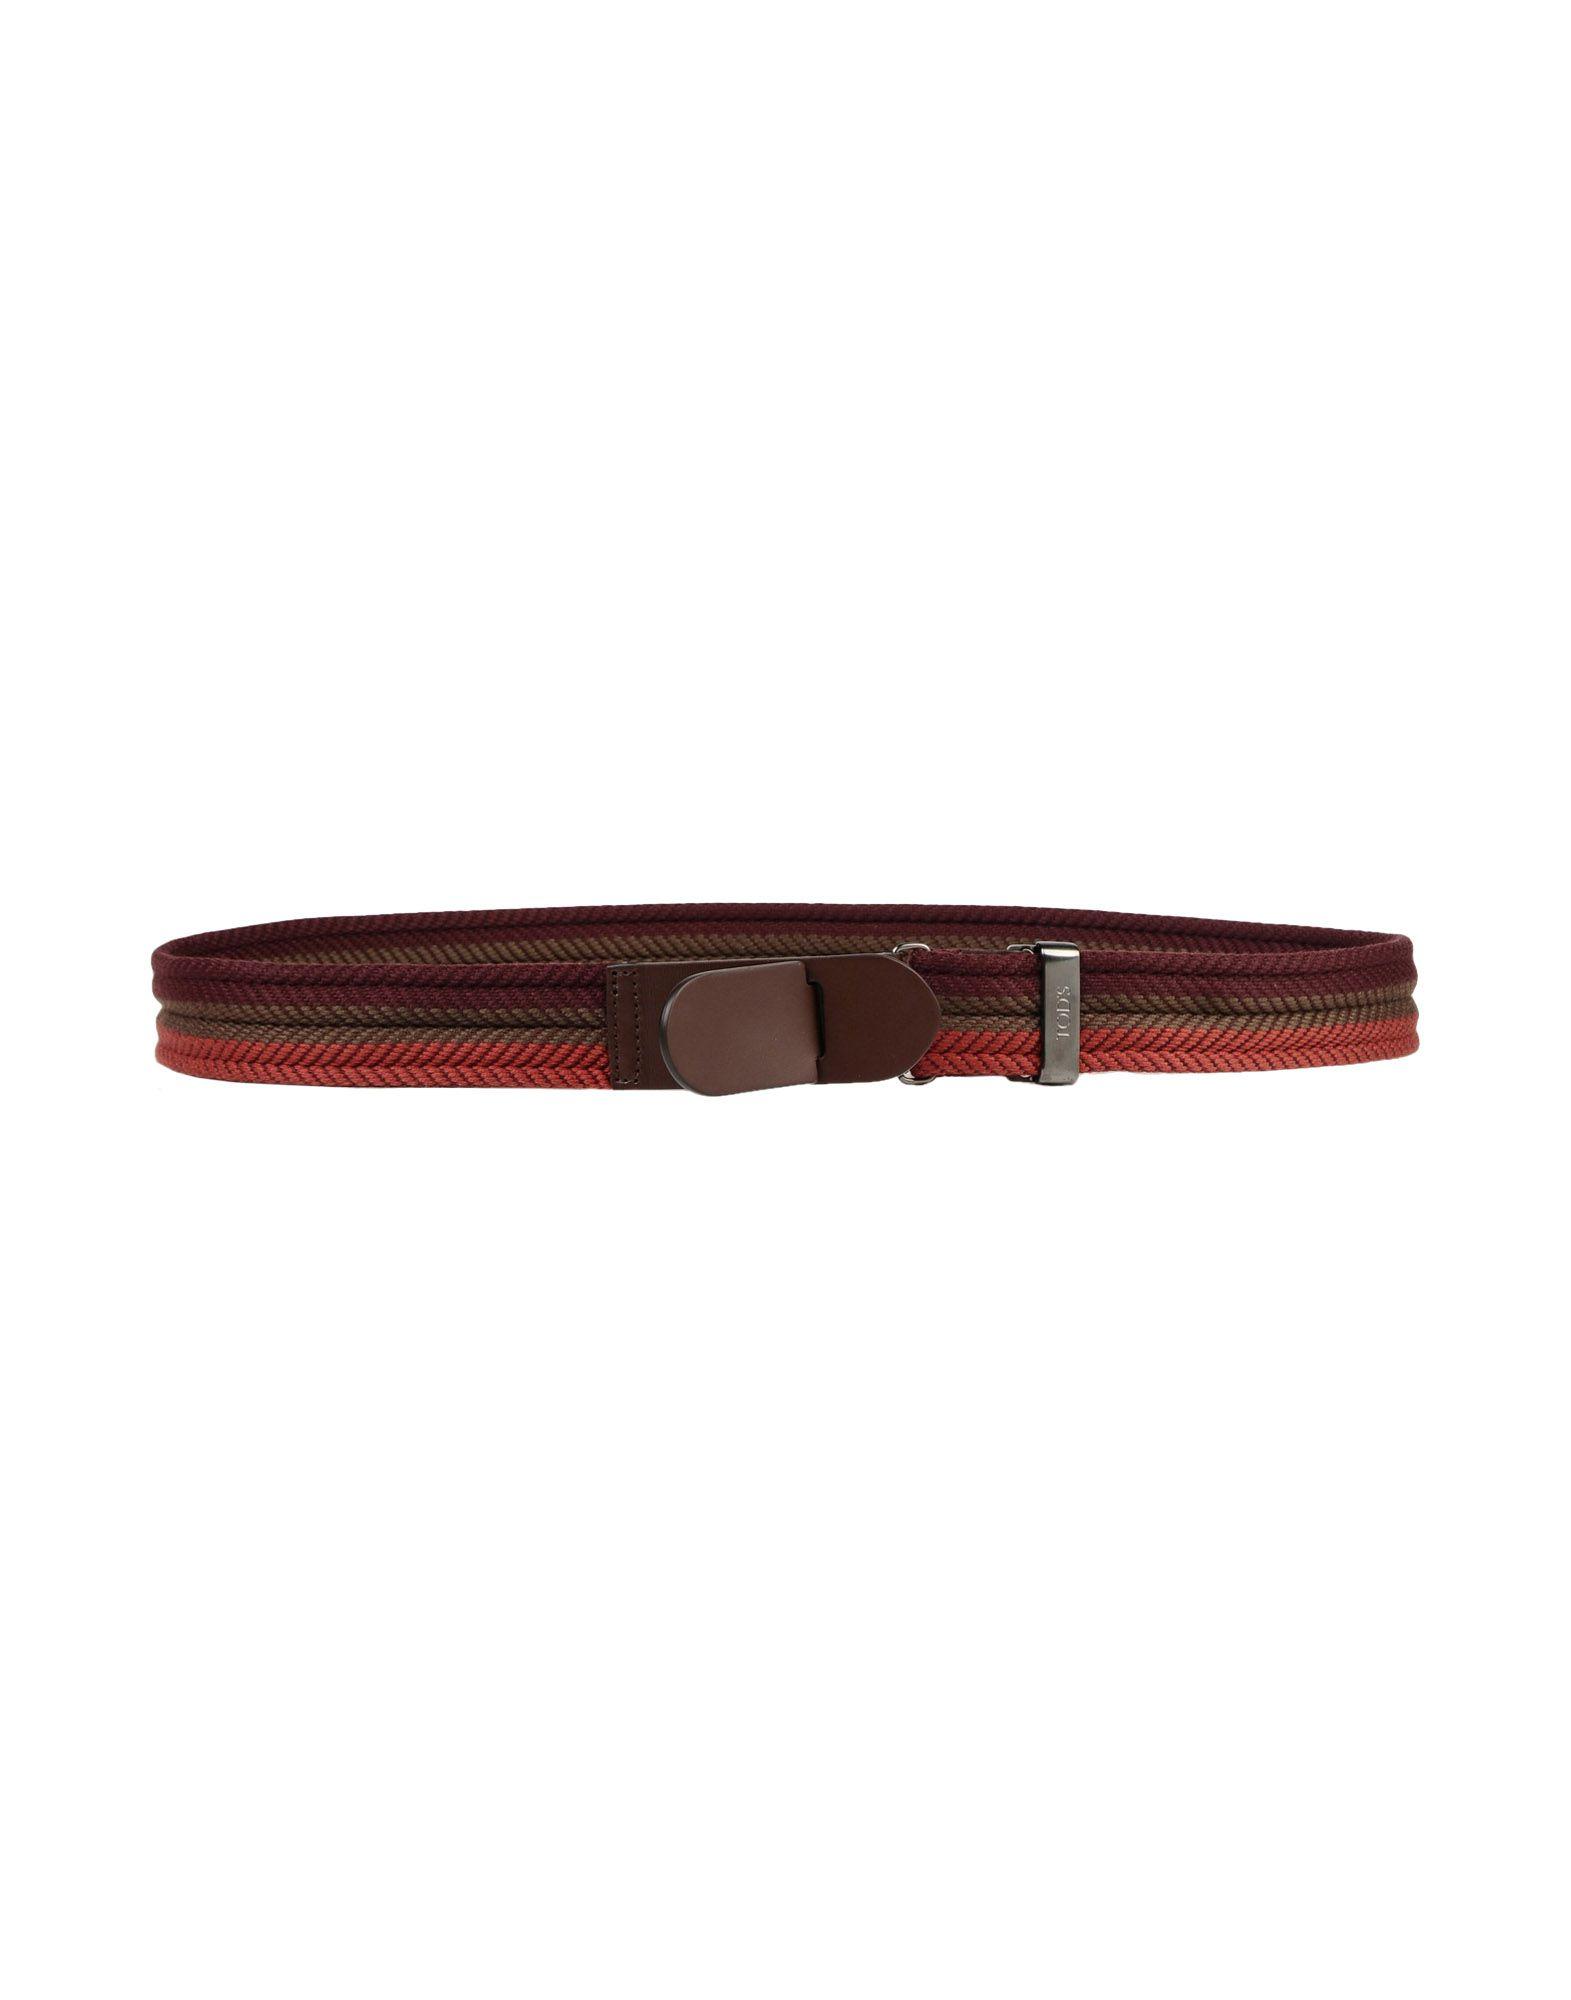 Small Leather Goods - Belts Roda CAZNhFfiSE